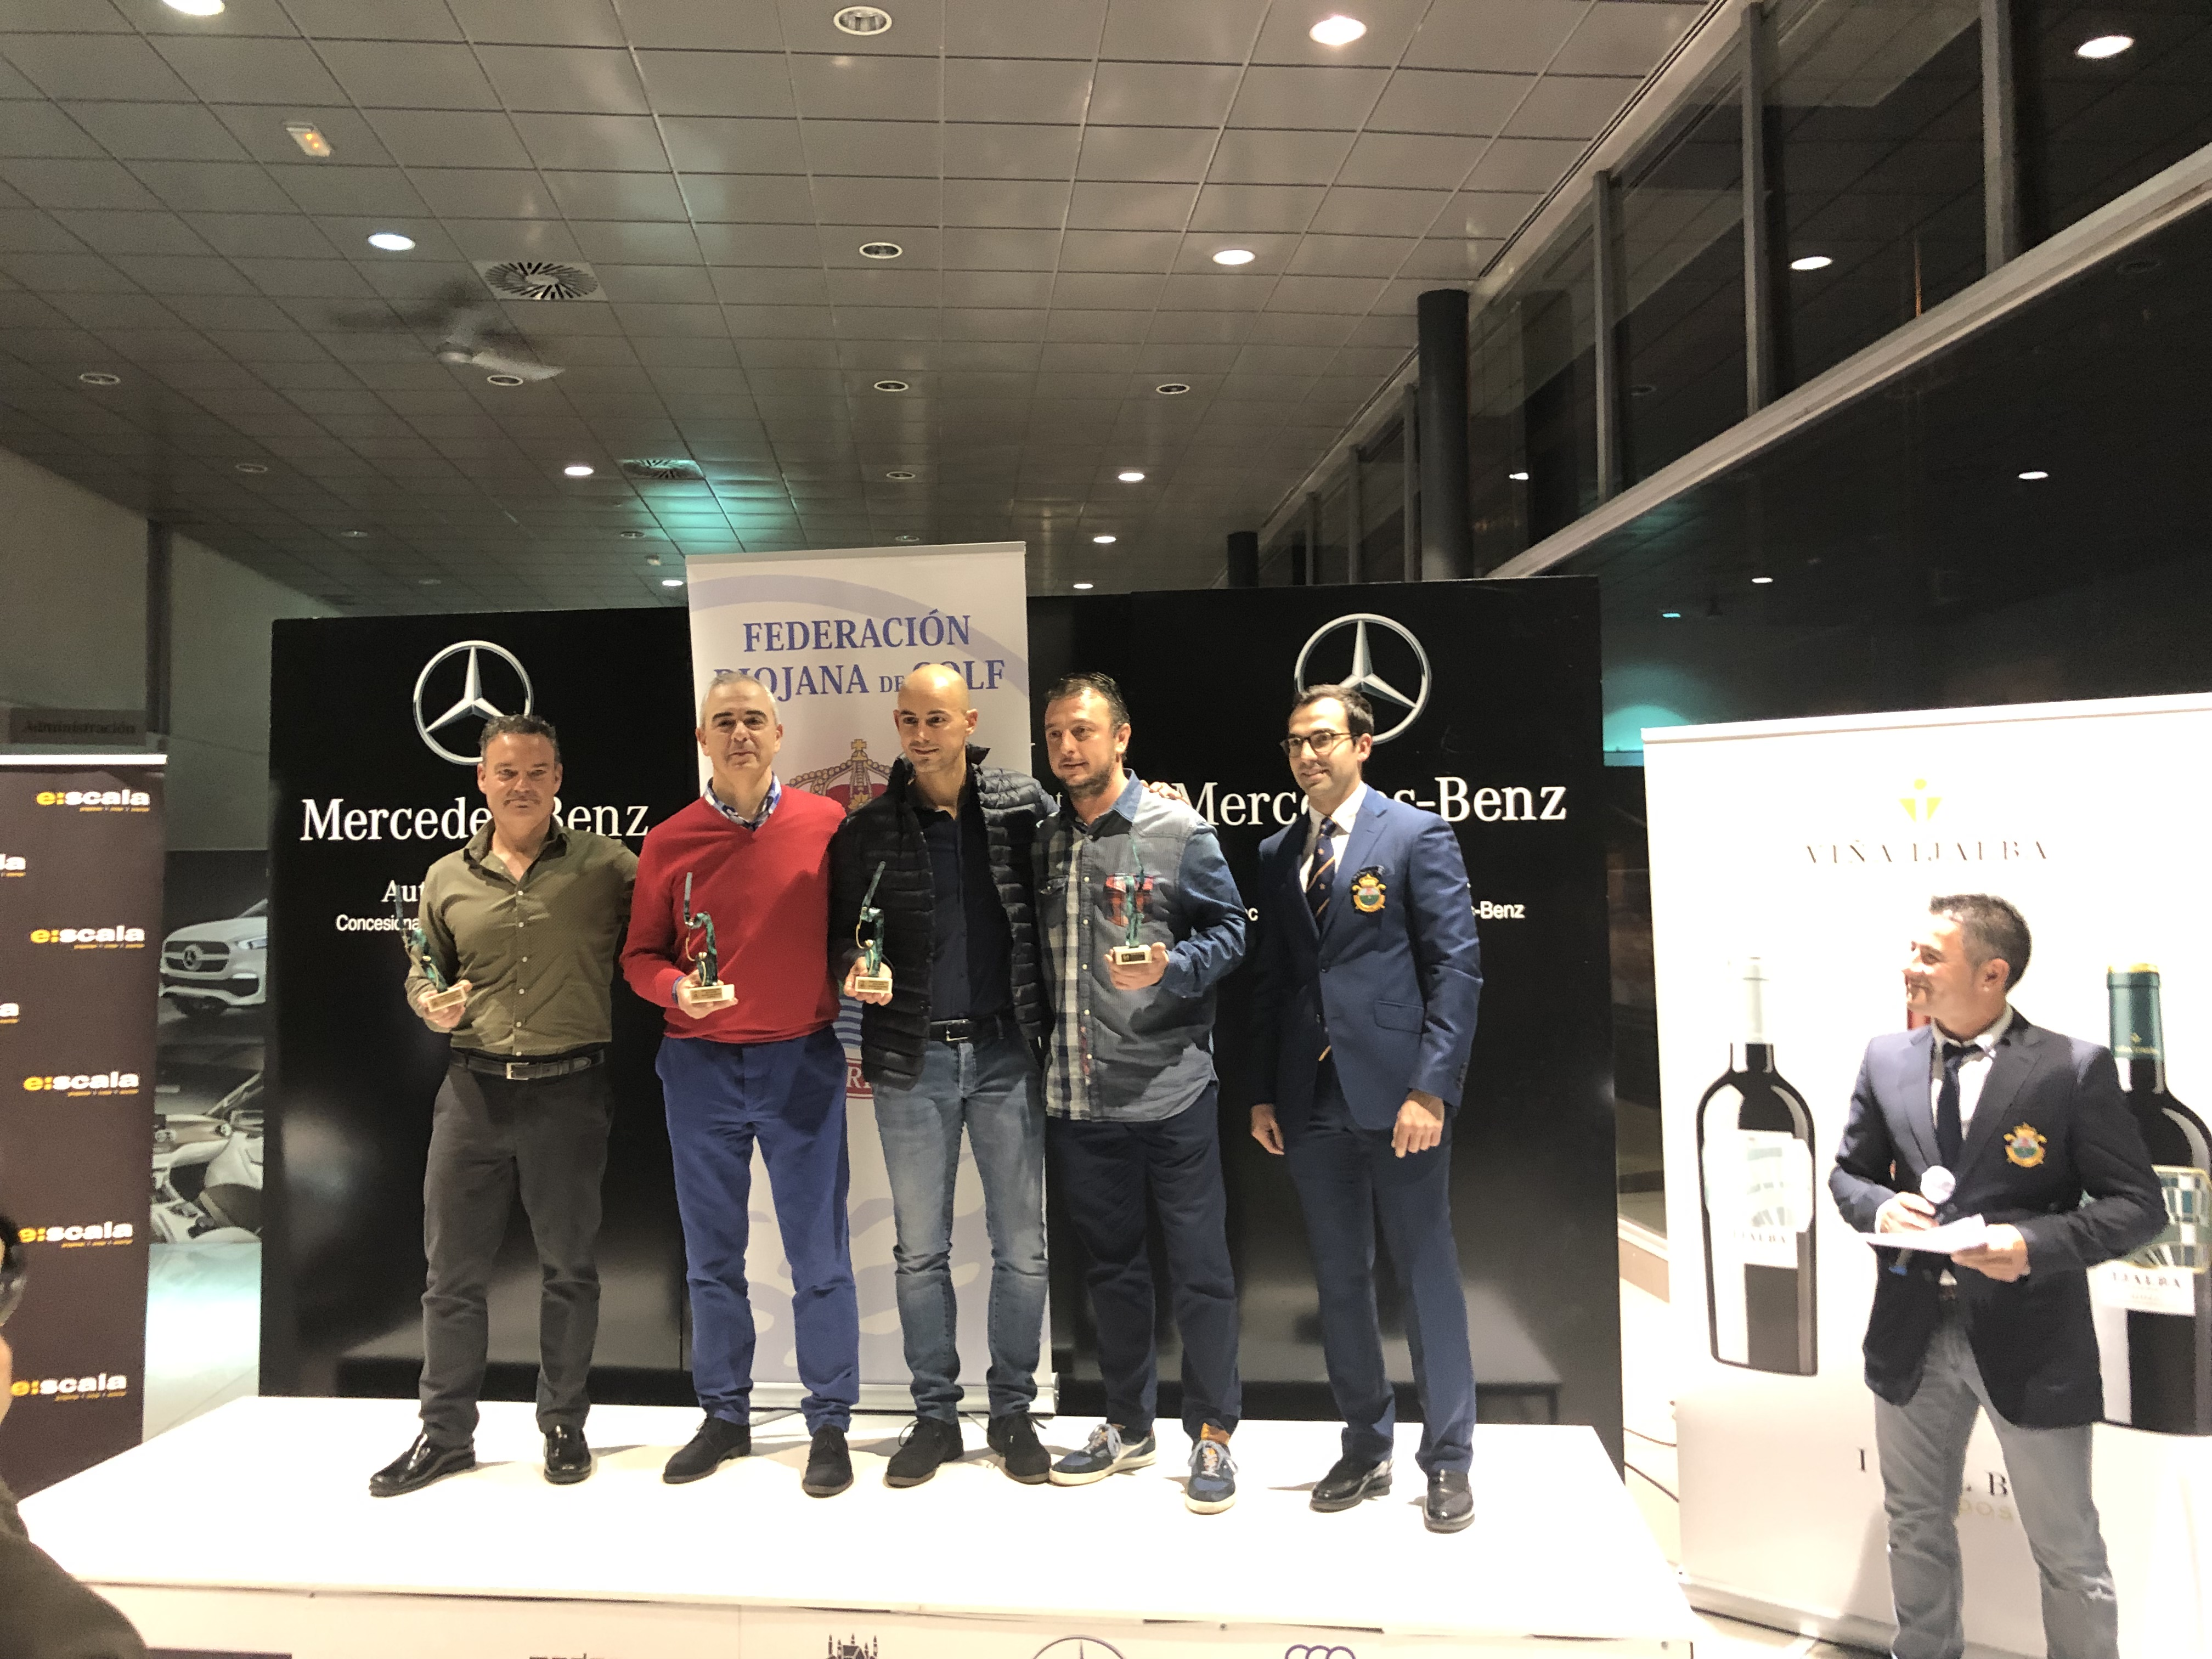 Torneo Federación Riojana de Golf 2018